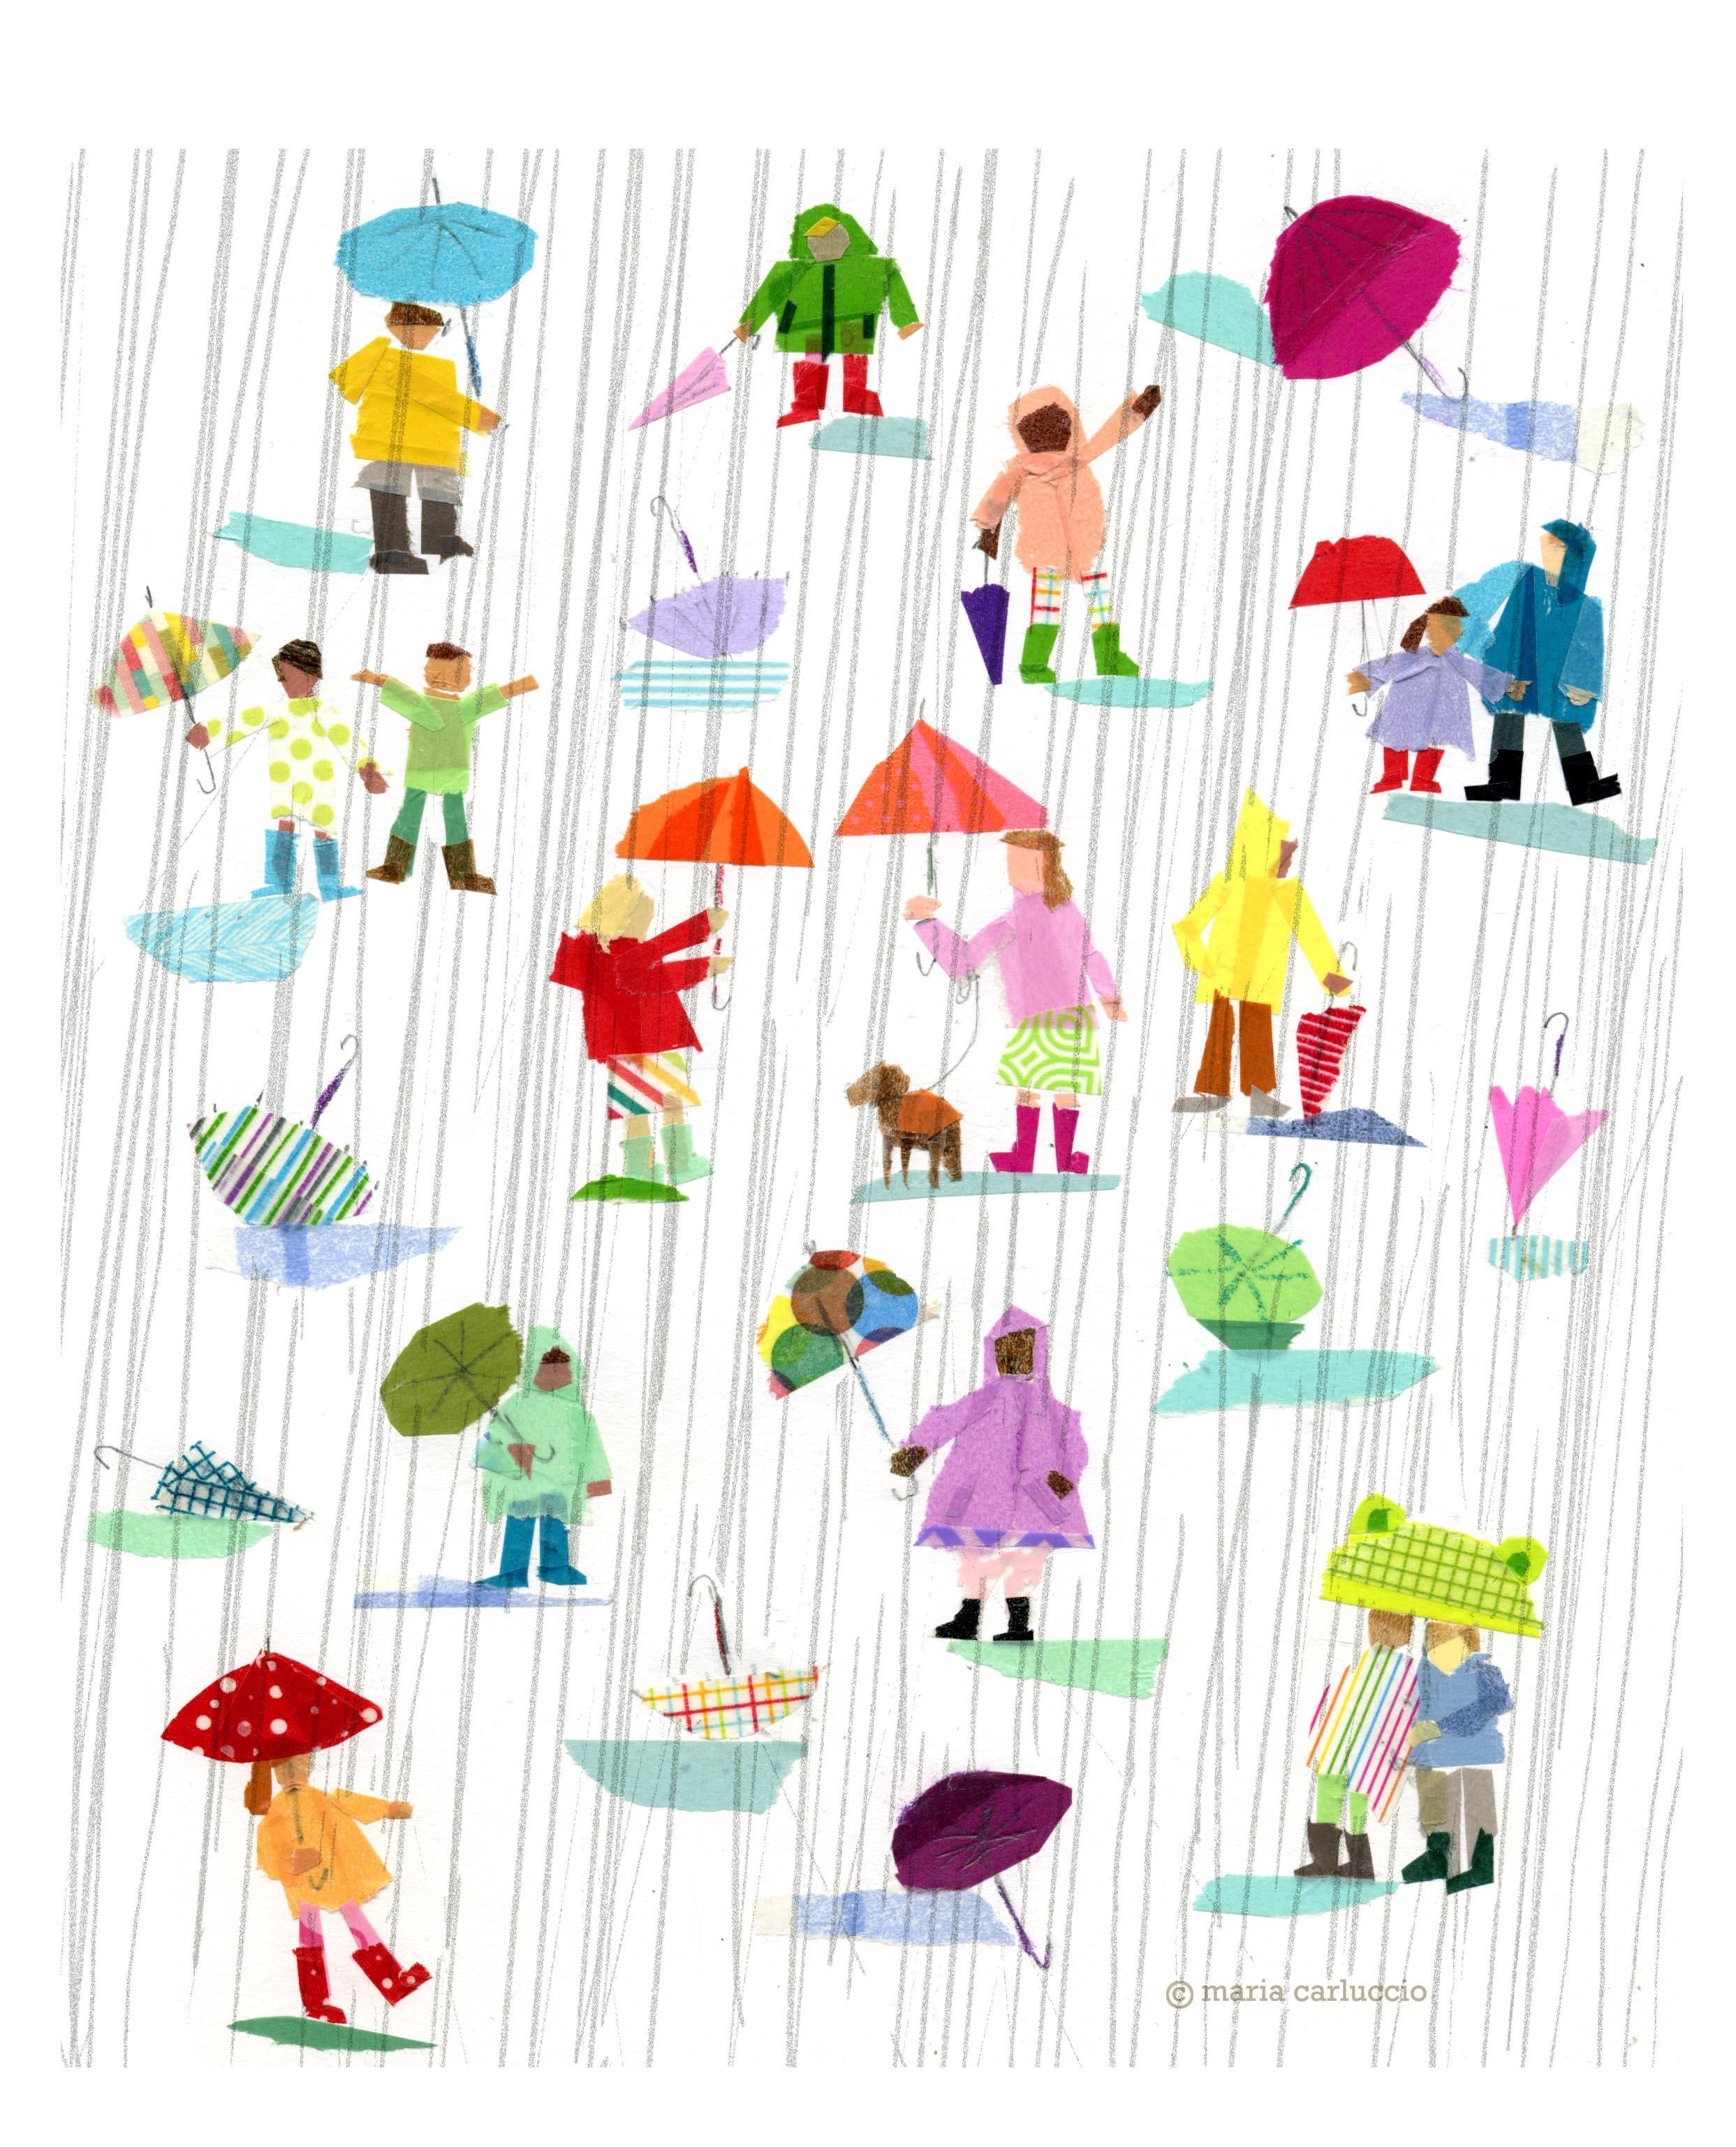 rain day kids3.jpg